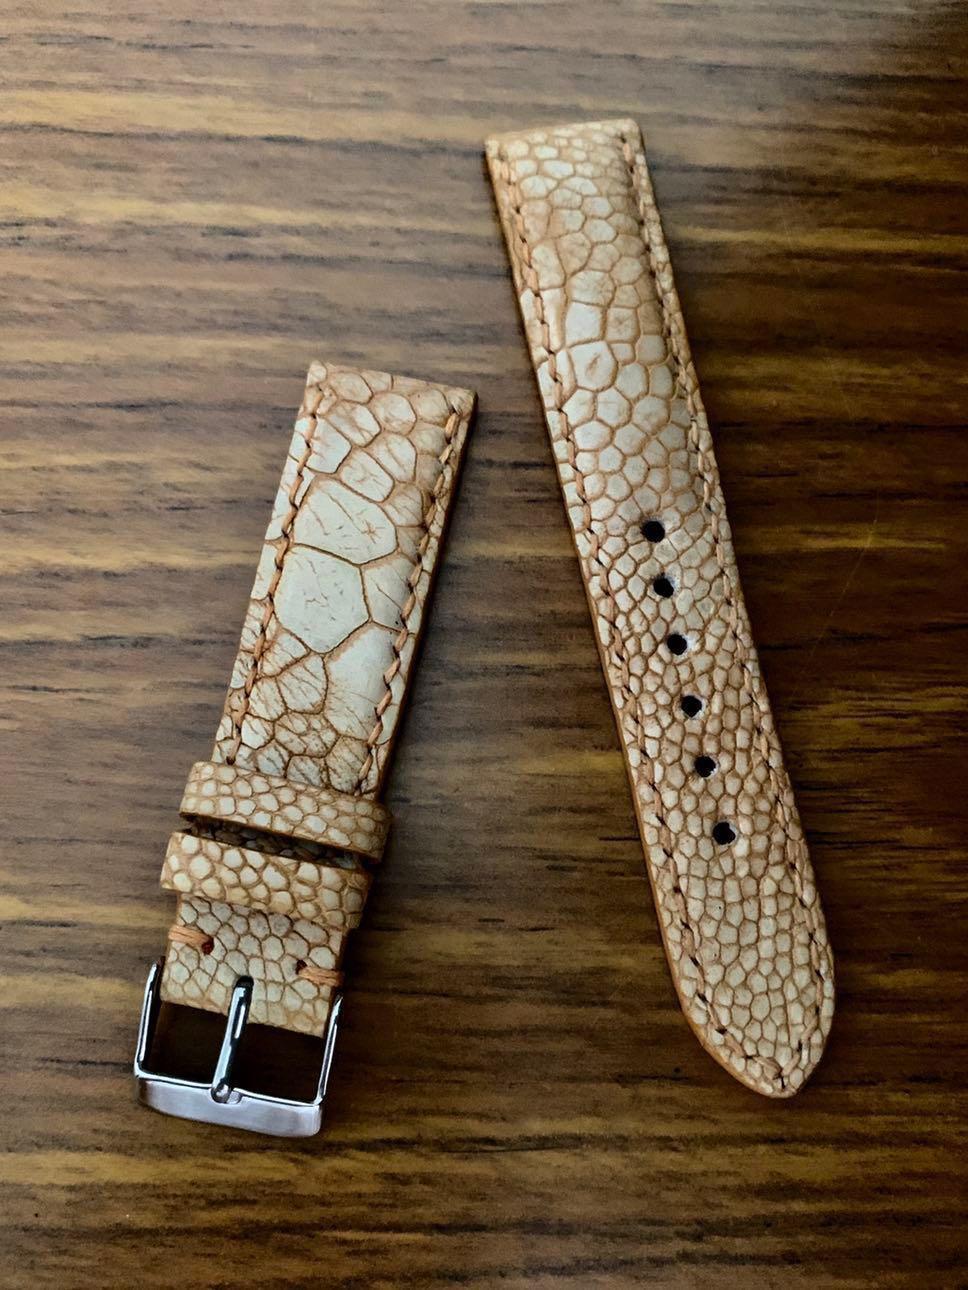 20mm/18mm Authentic Unique Quinoa Beige Brown Ostrich Leg Watch Strap (special leg grains) #MRTHougang #MRTSerangoon #MRTSengkang #MRTPunggol #MRTRaffles #MRTBedok #MRTTampines #MRTCCK #MRTJurongEast #MRTYishun